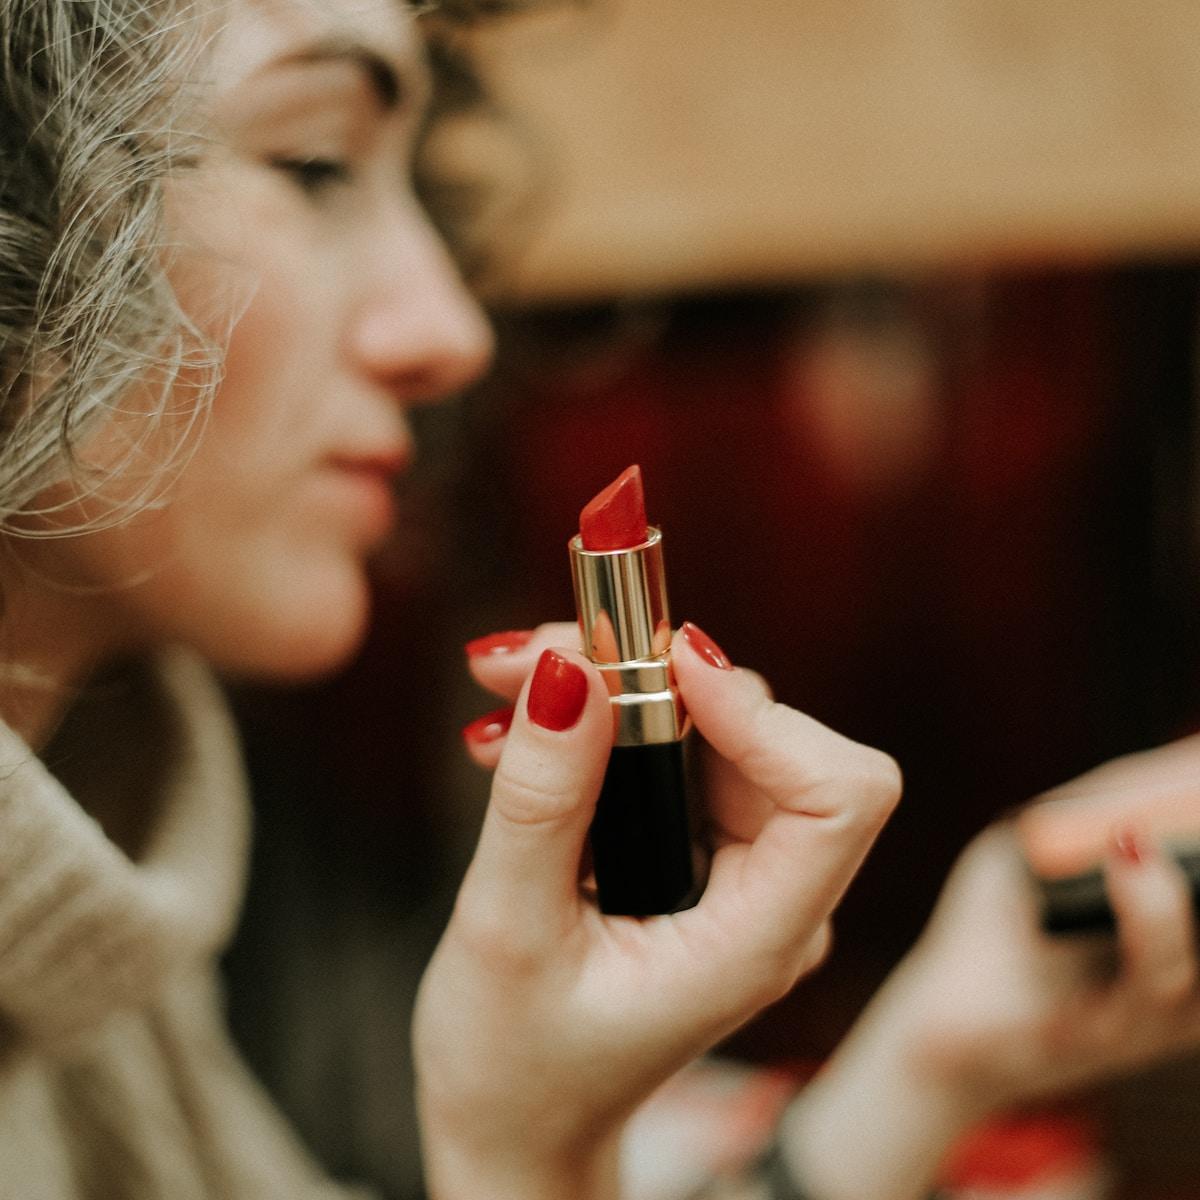 pintalabios, caducidad, woman in gray sweater holding lipstick